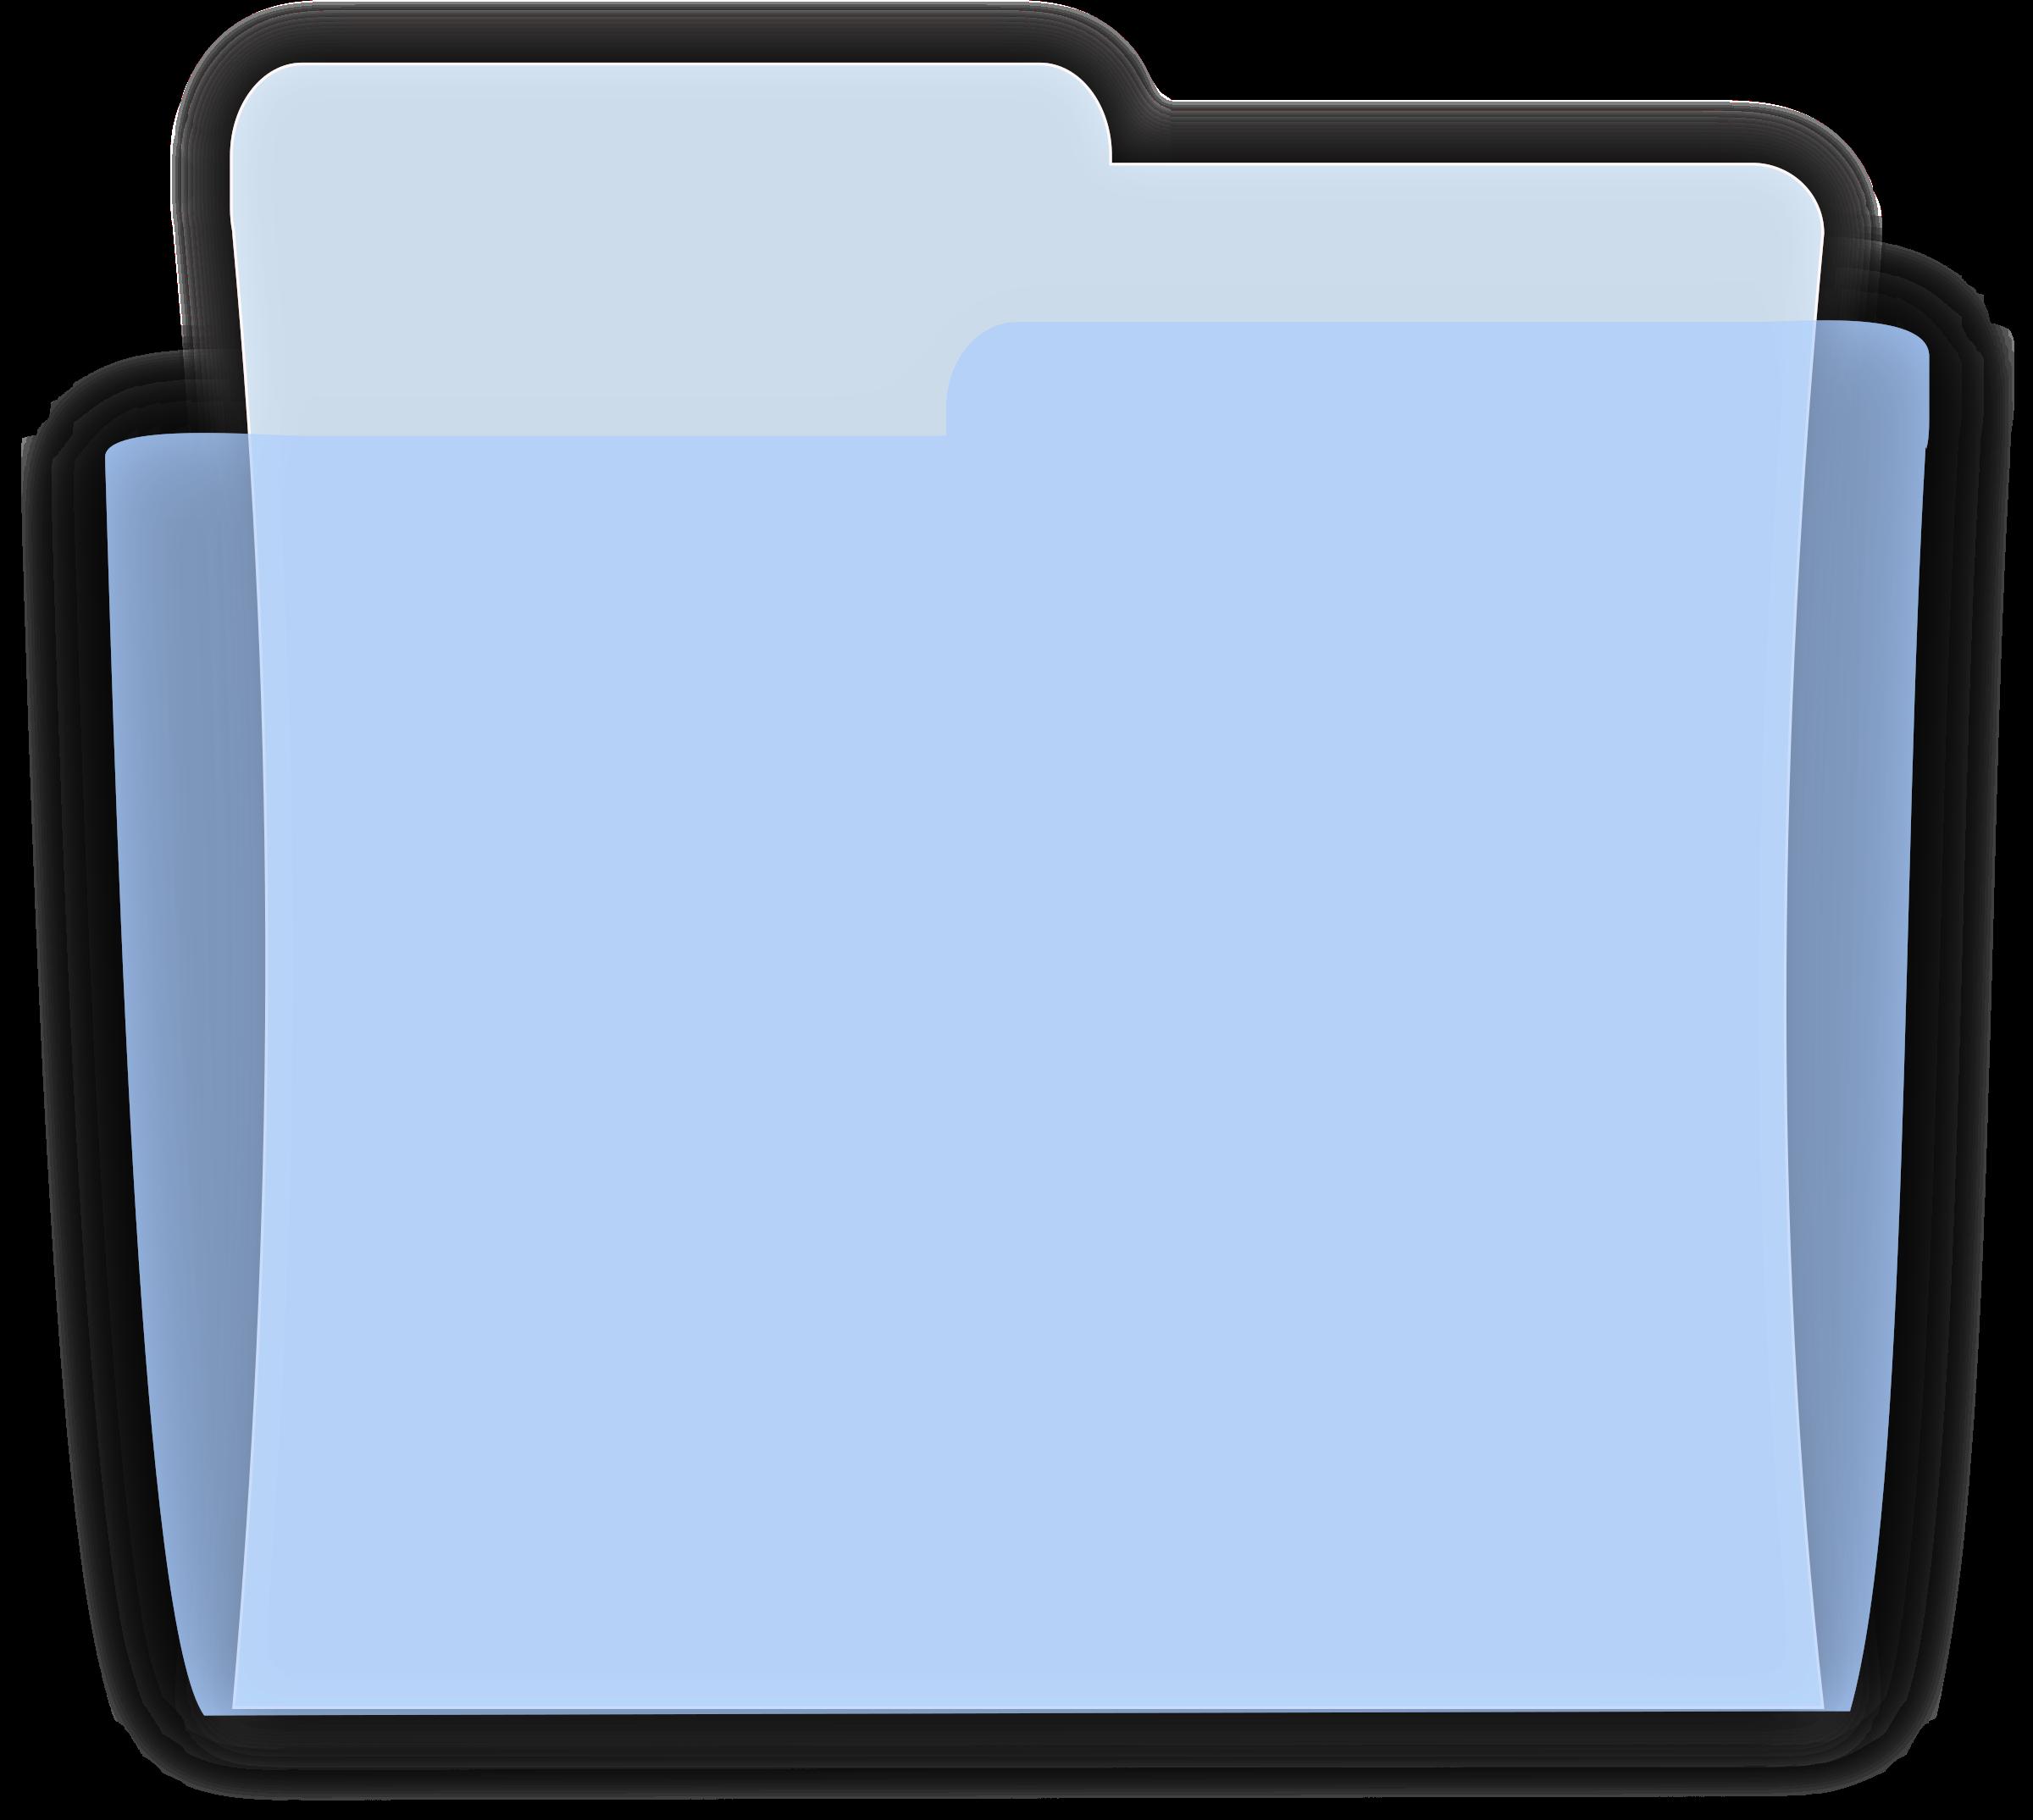 Folder clipart blue folder. Mac icons png free